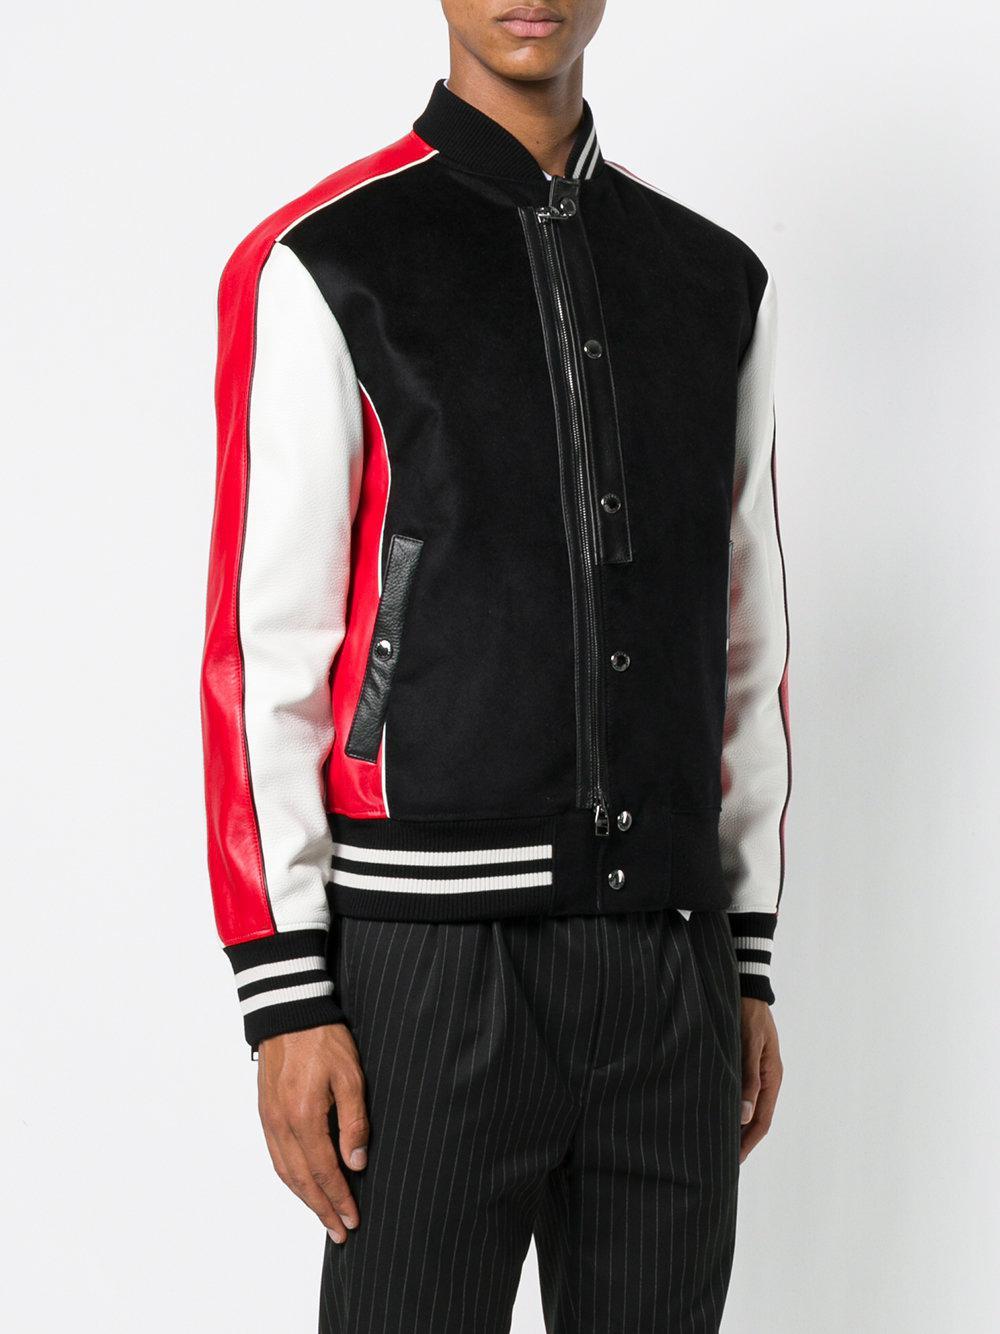 Alexander McQueen Wool Button-up Bomber Jacket in Black for Men